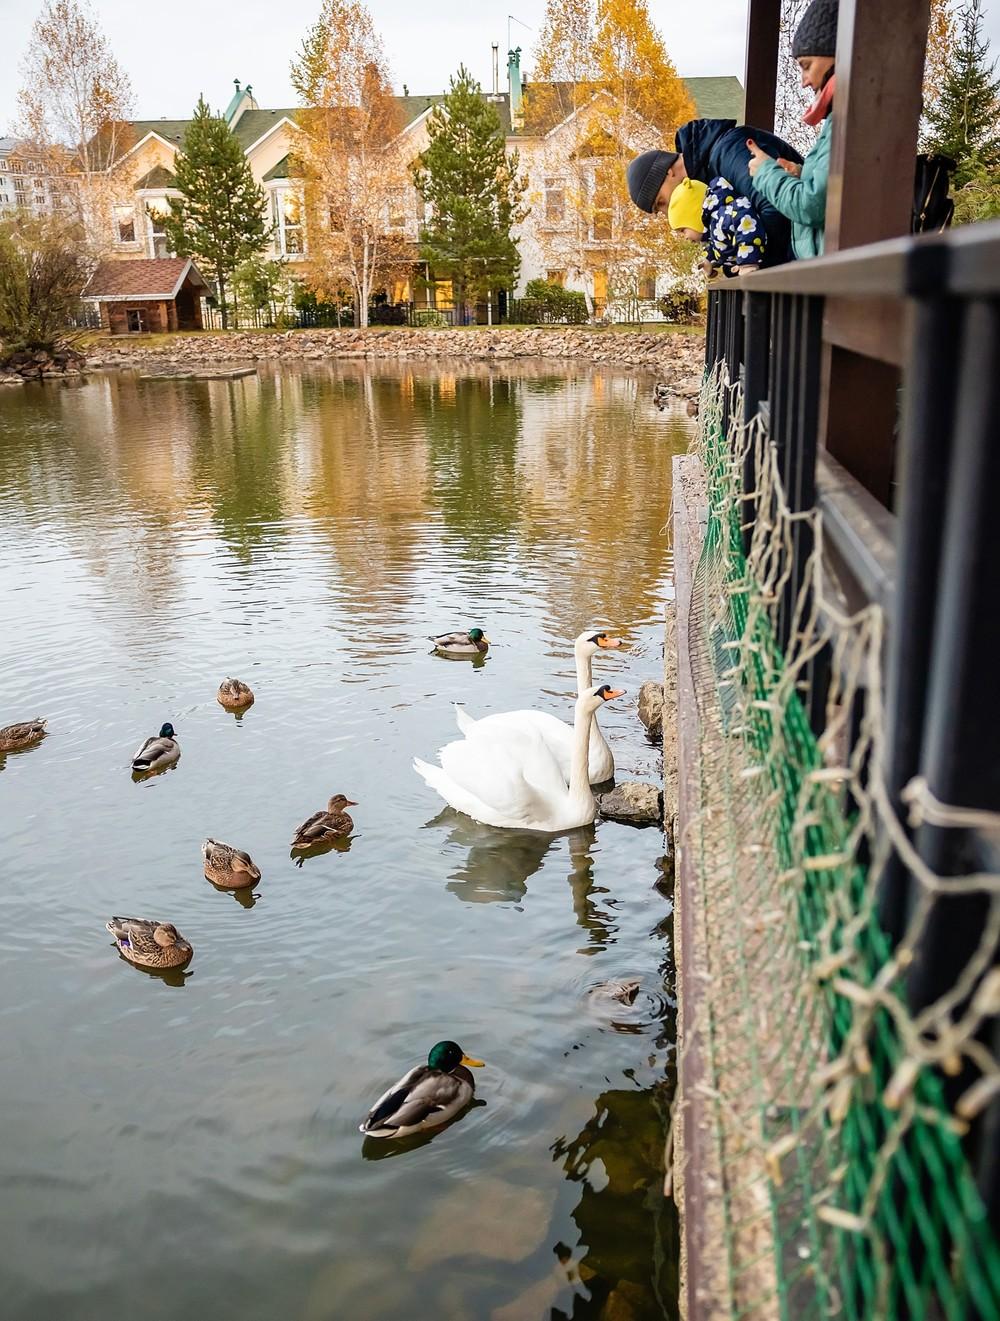 Mon Plaisir кафе ресторан Красноярск пруд лебеди банкет удачный лебеди пруд